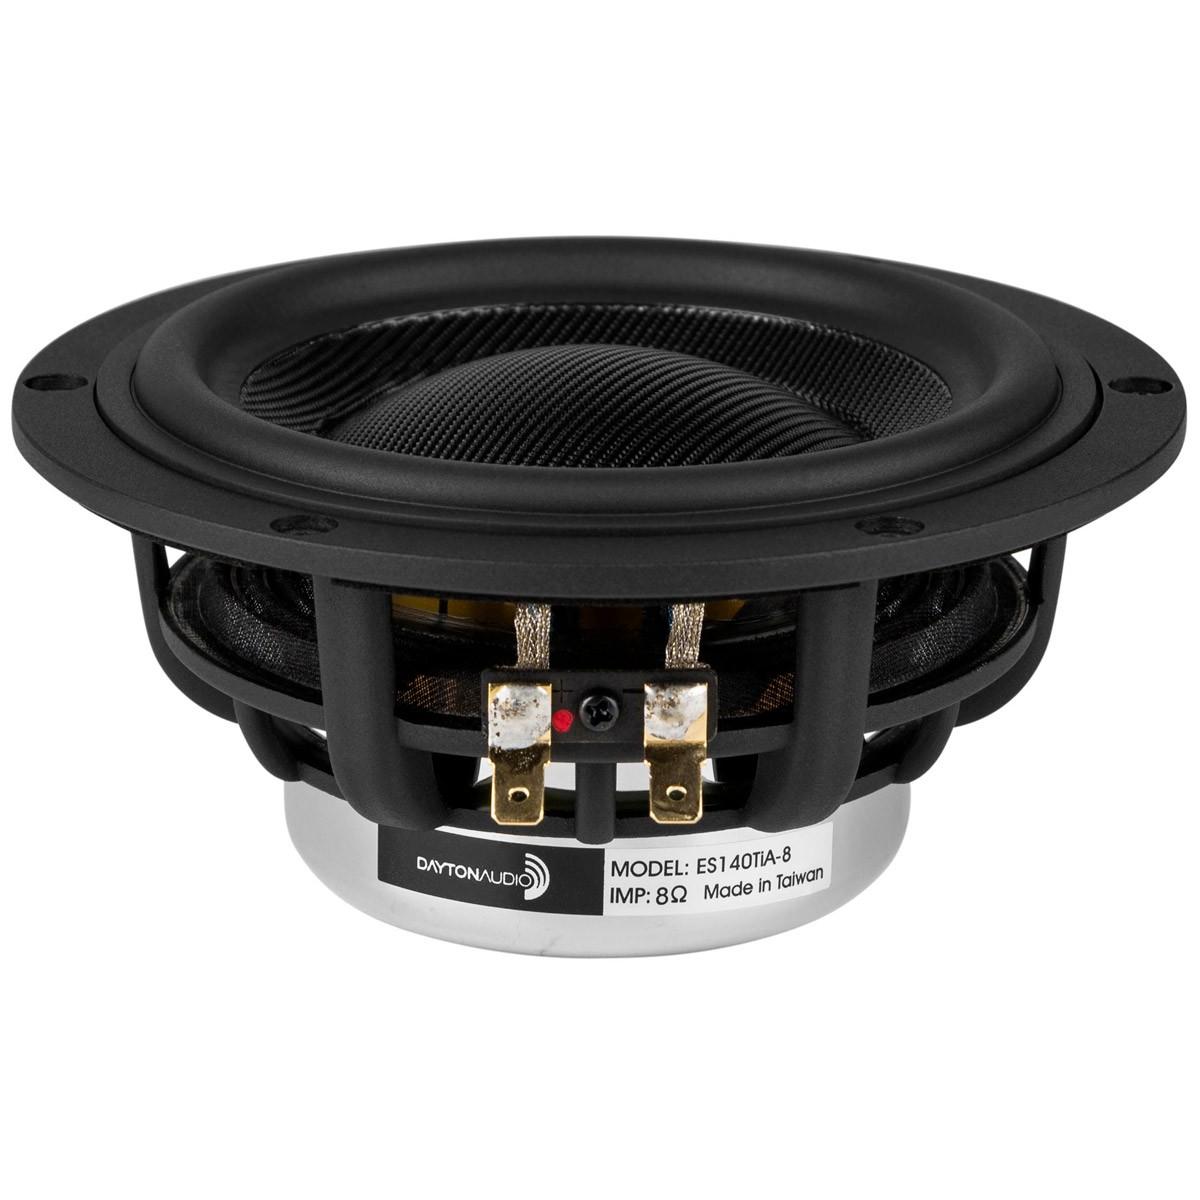 DAYTON AUDIO ES140TiA-8 Speaker Driver Woofer 100W 8 Ohm 84dB 45Hz - 41kHz Ø14cm